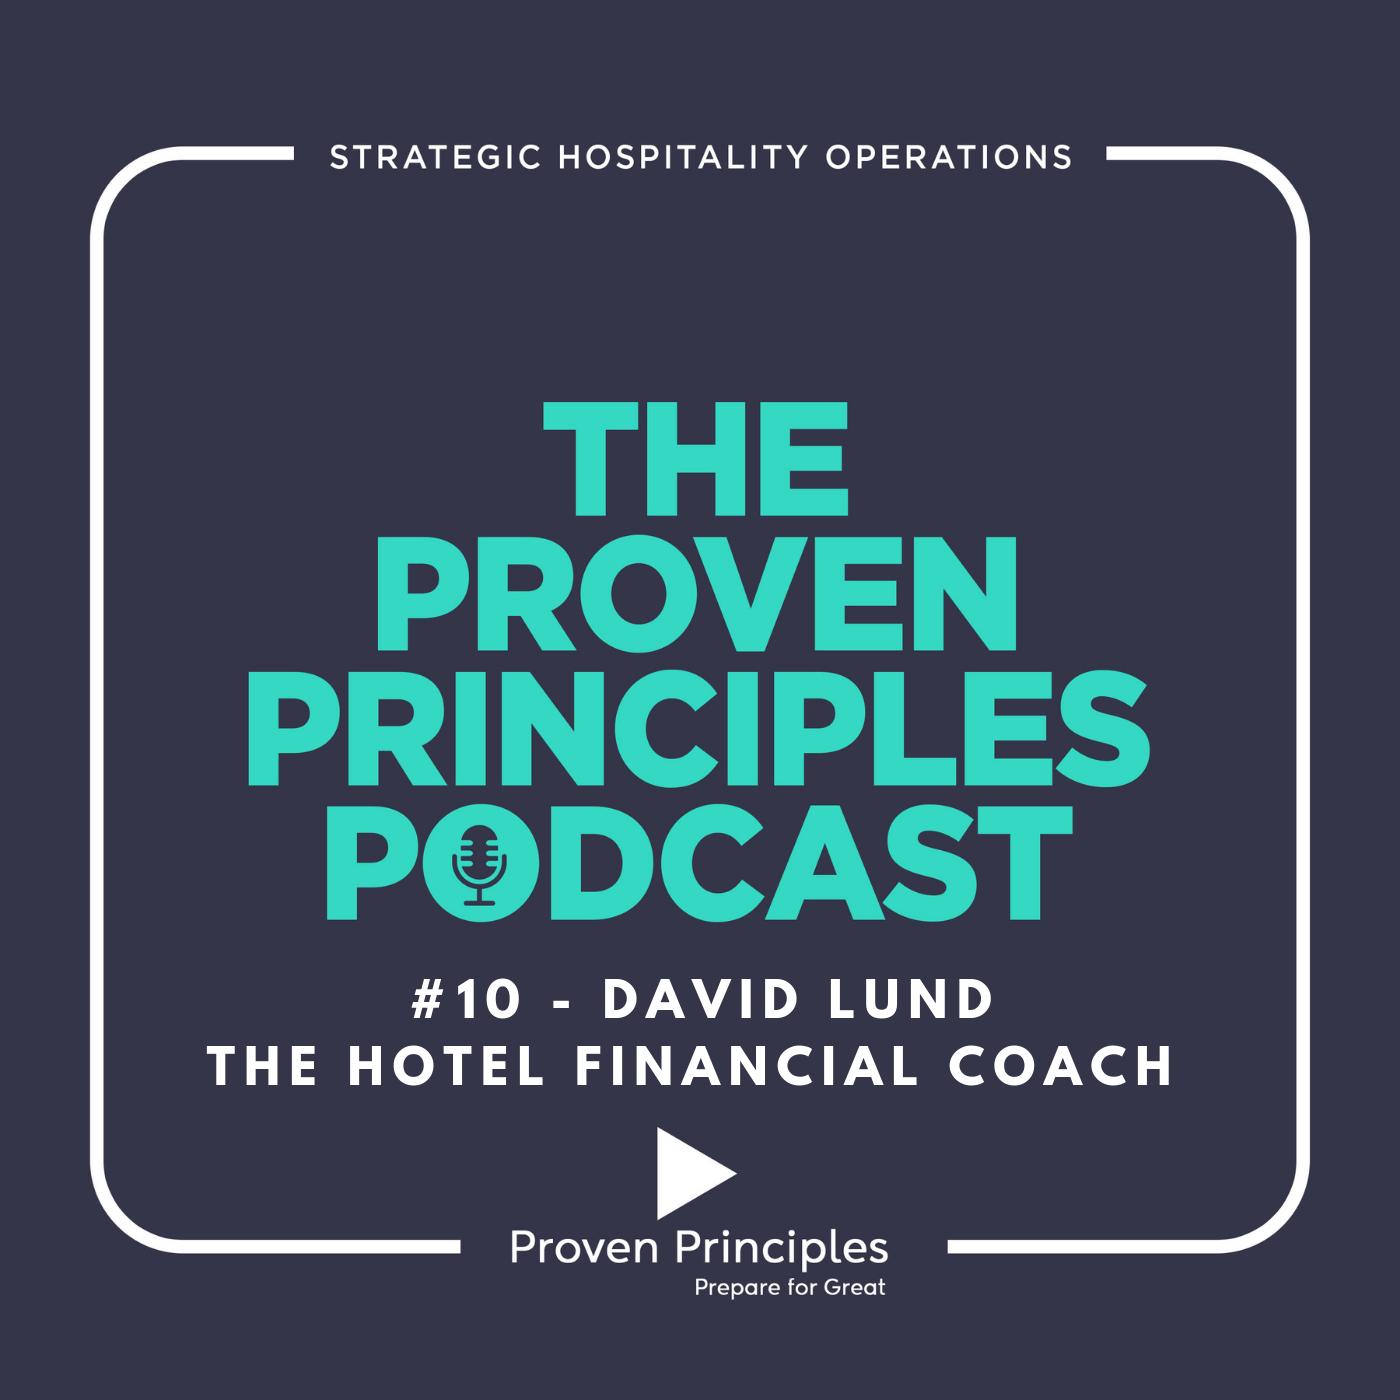 David Lund The Hotel Financial Coach